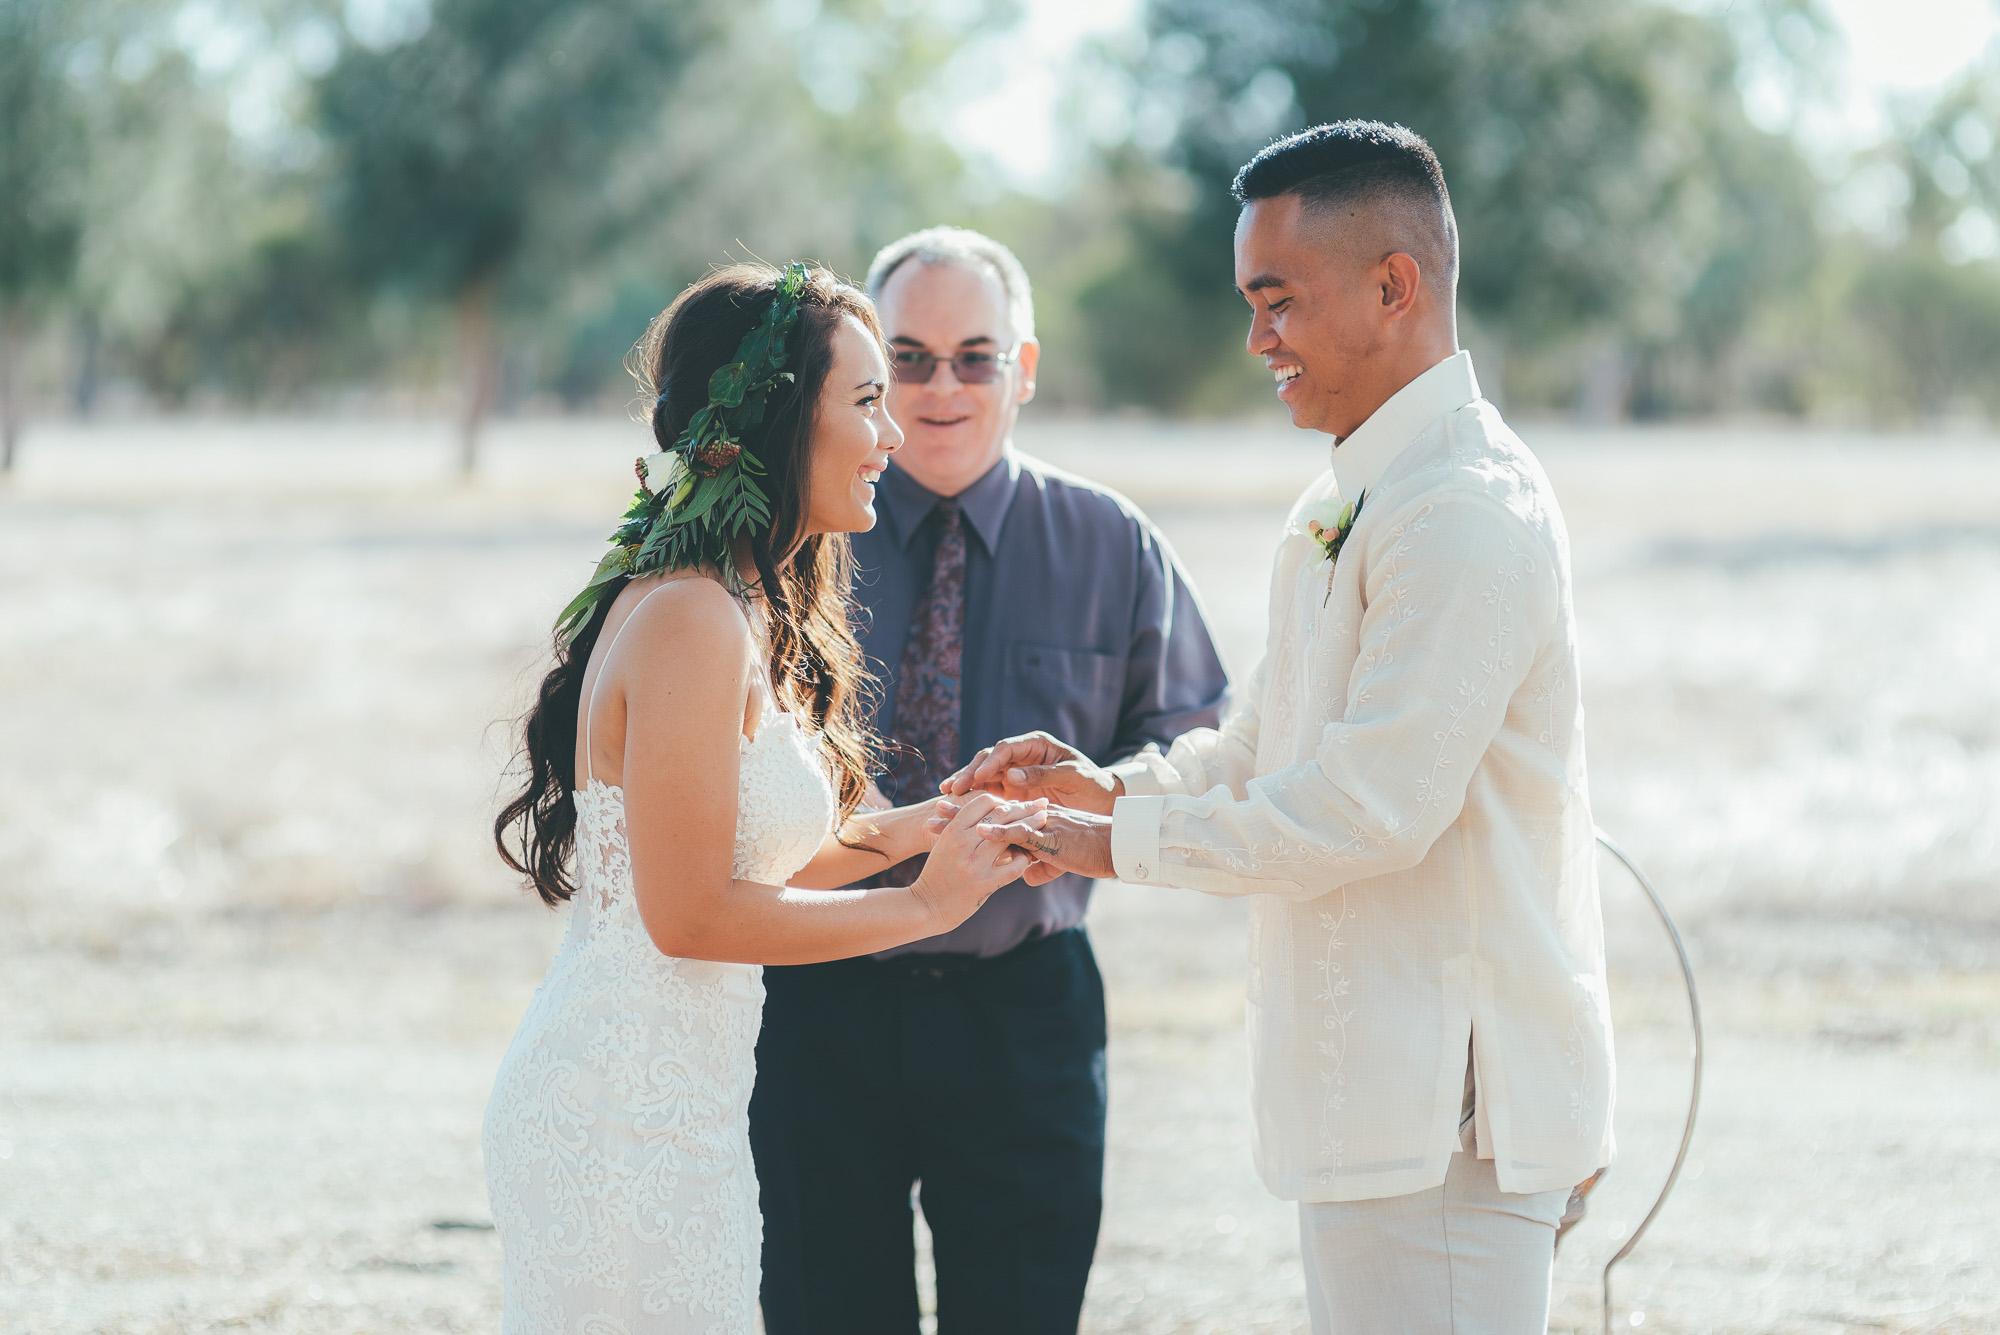 wedding-photographer-outdoor-casual-styled-los-angeles-australia-california-international-earthbound -45.jpg